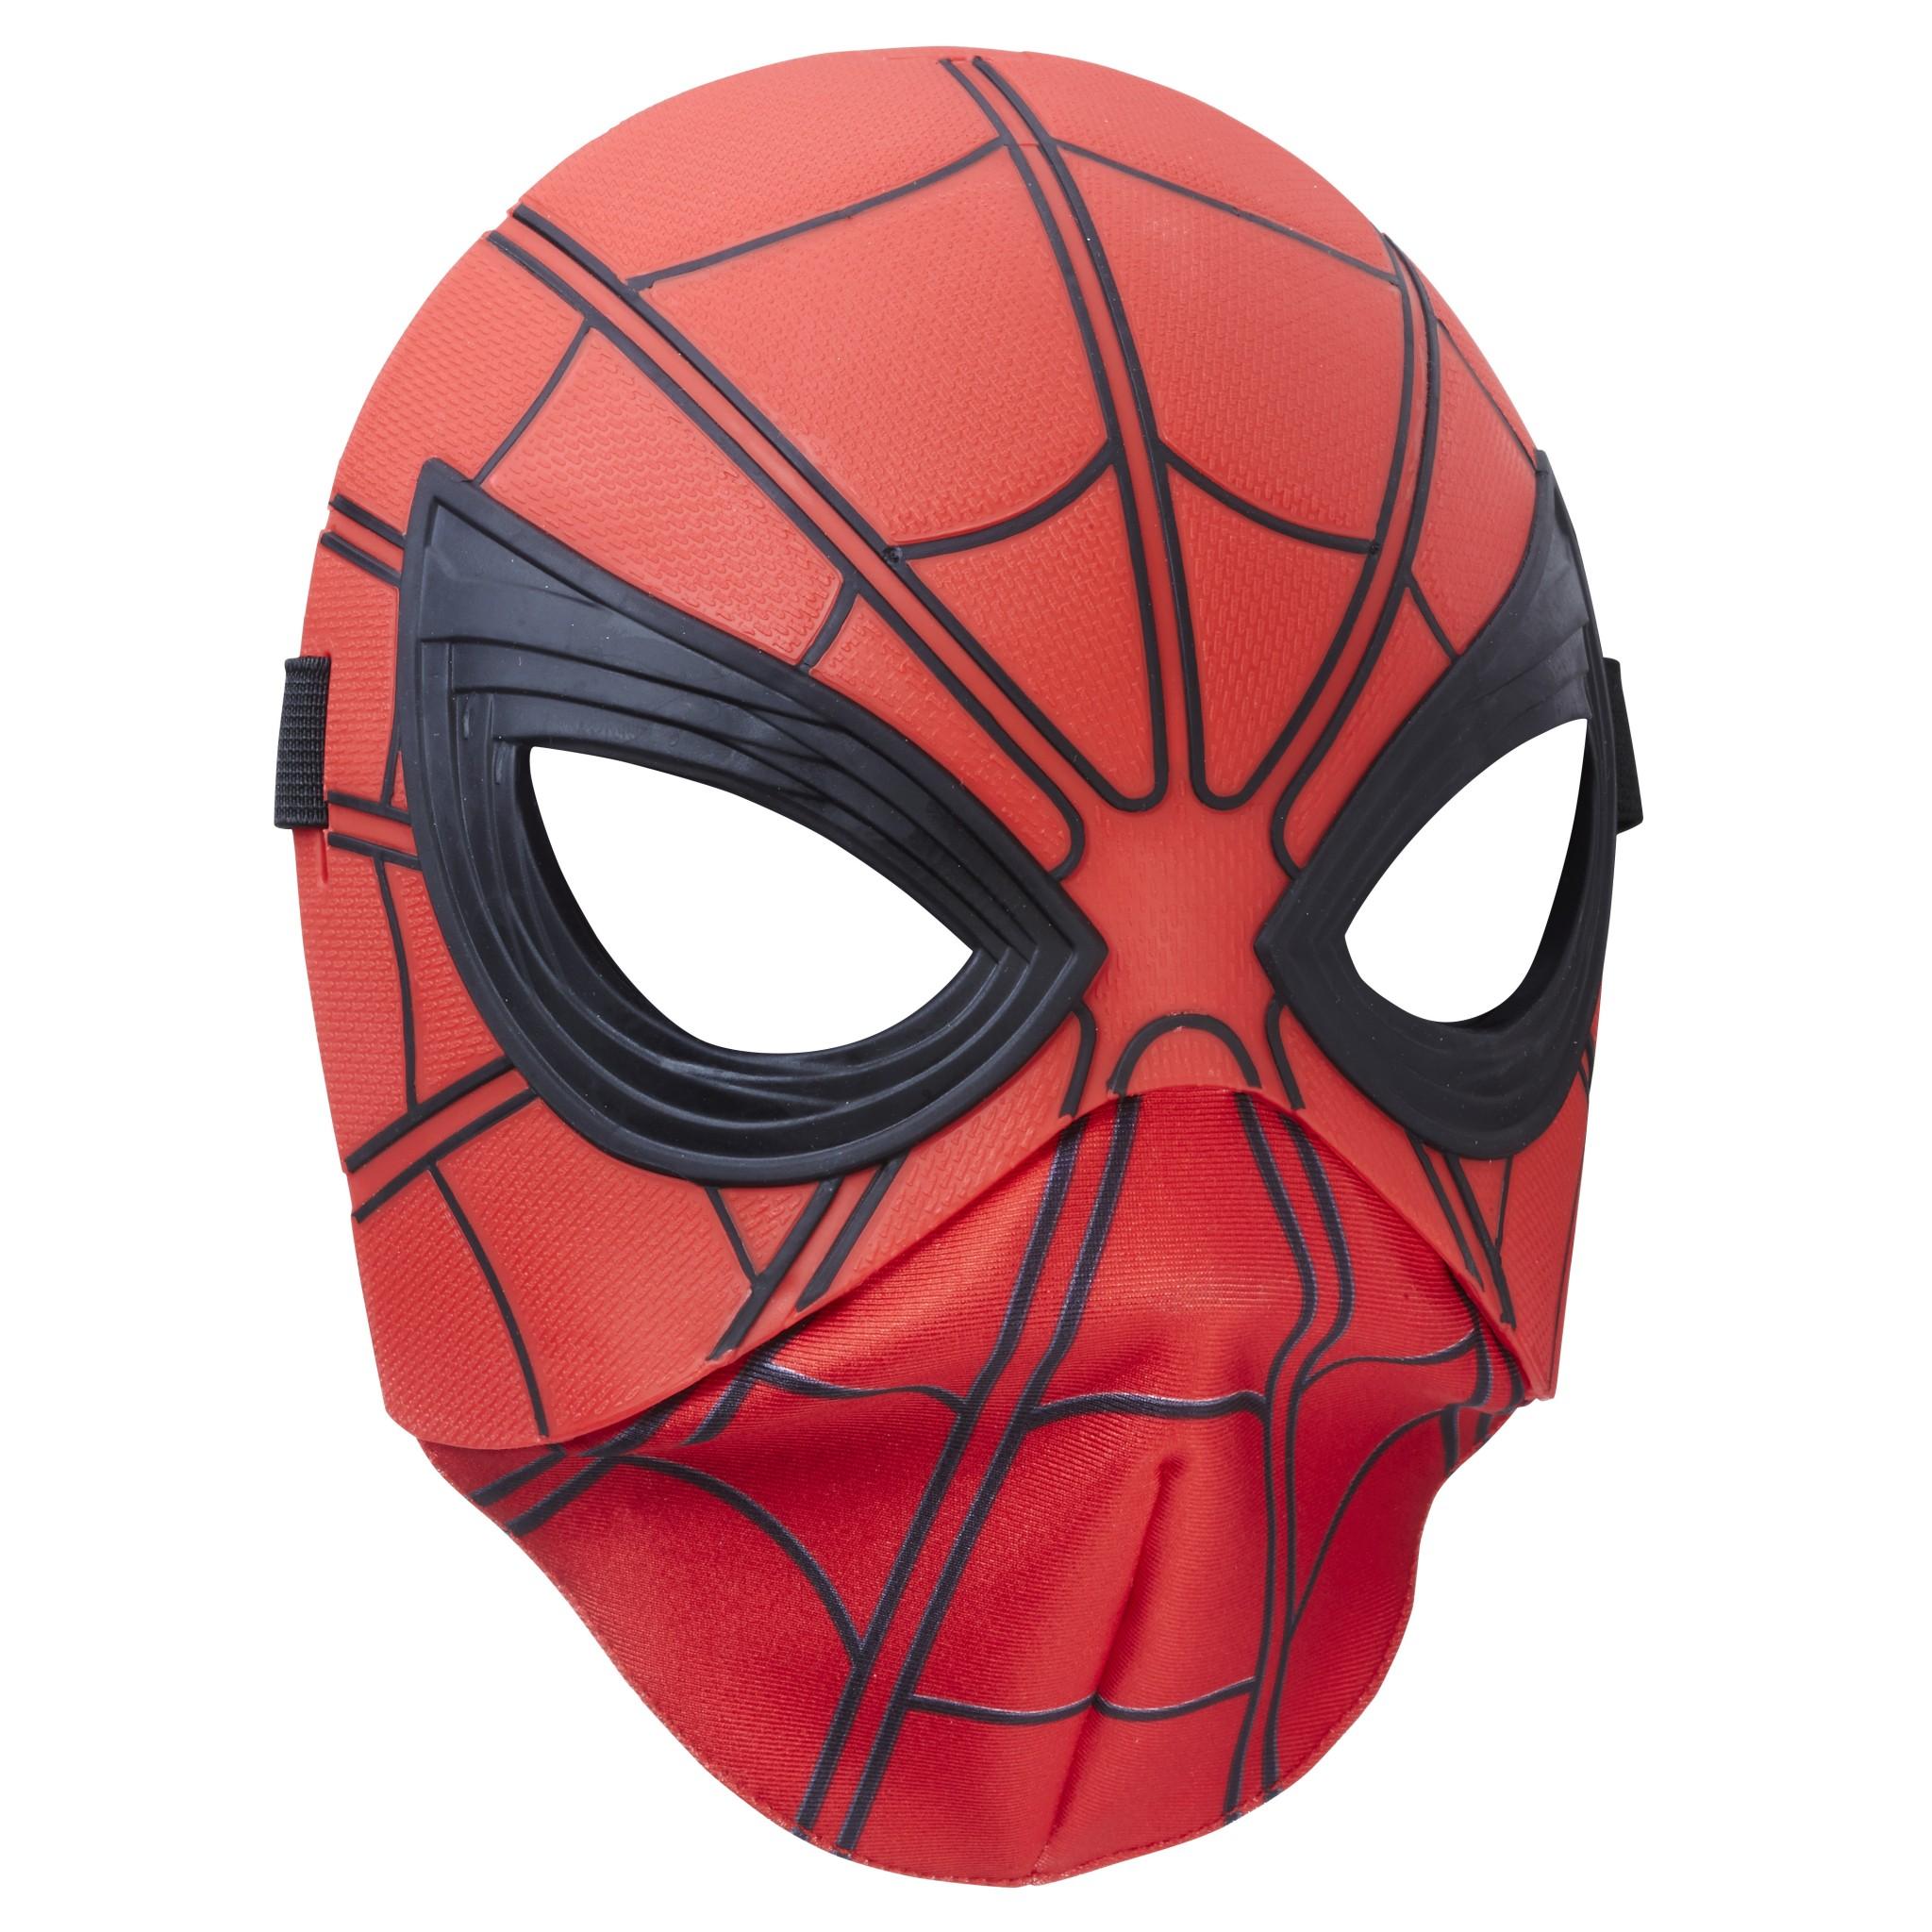 Маска Человека-паука - Герои MARVEL, артикул: 166854